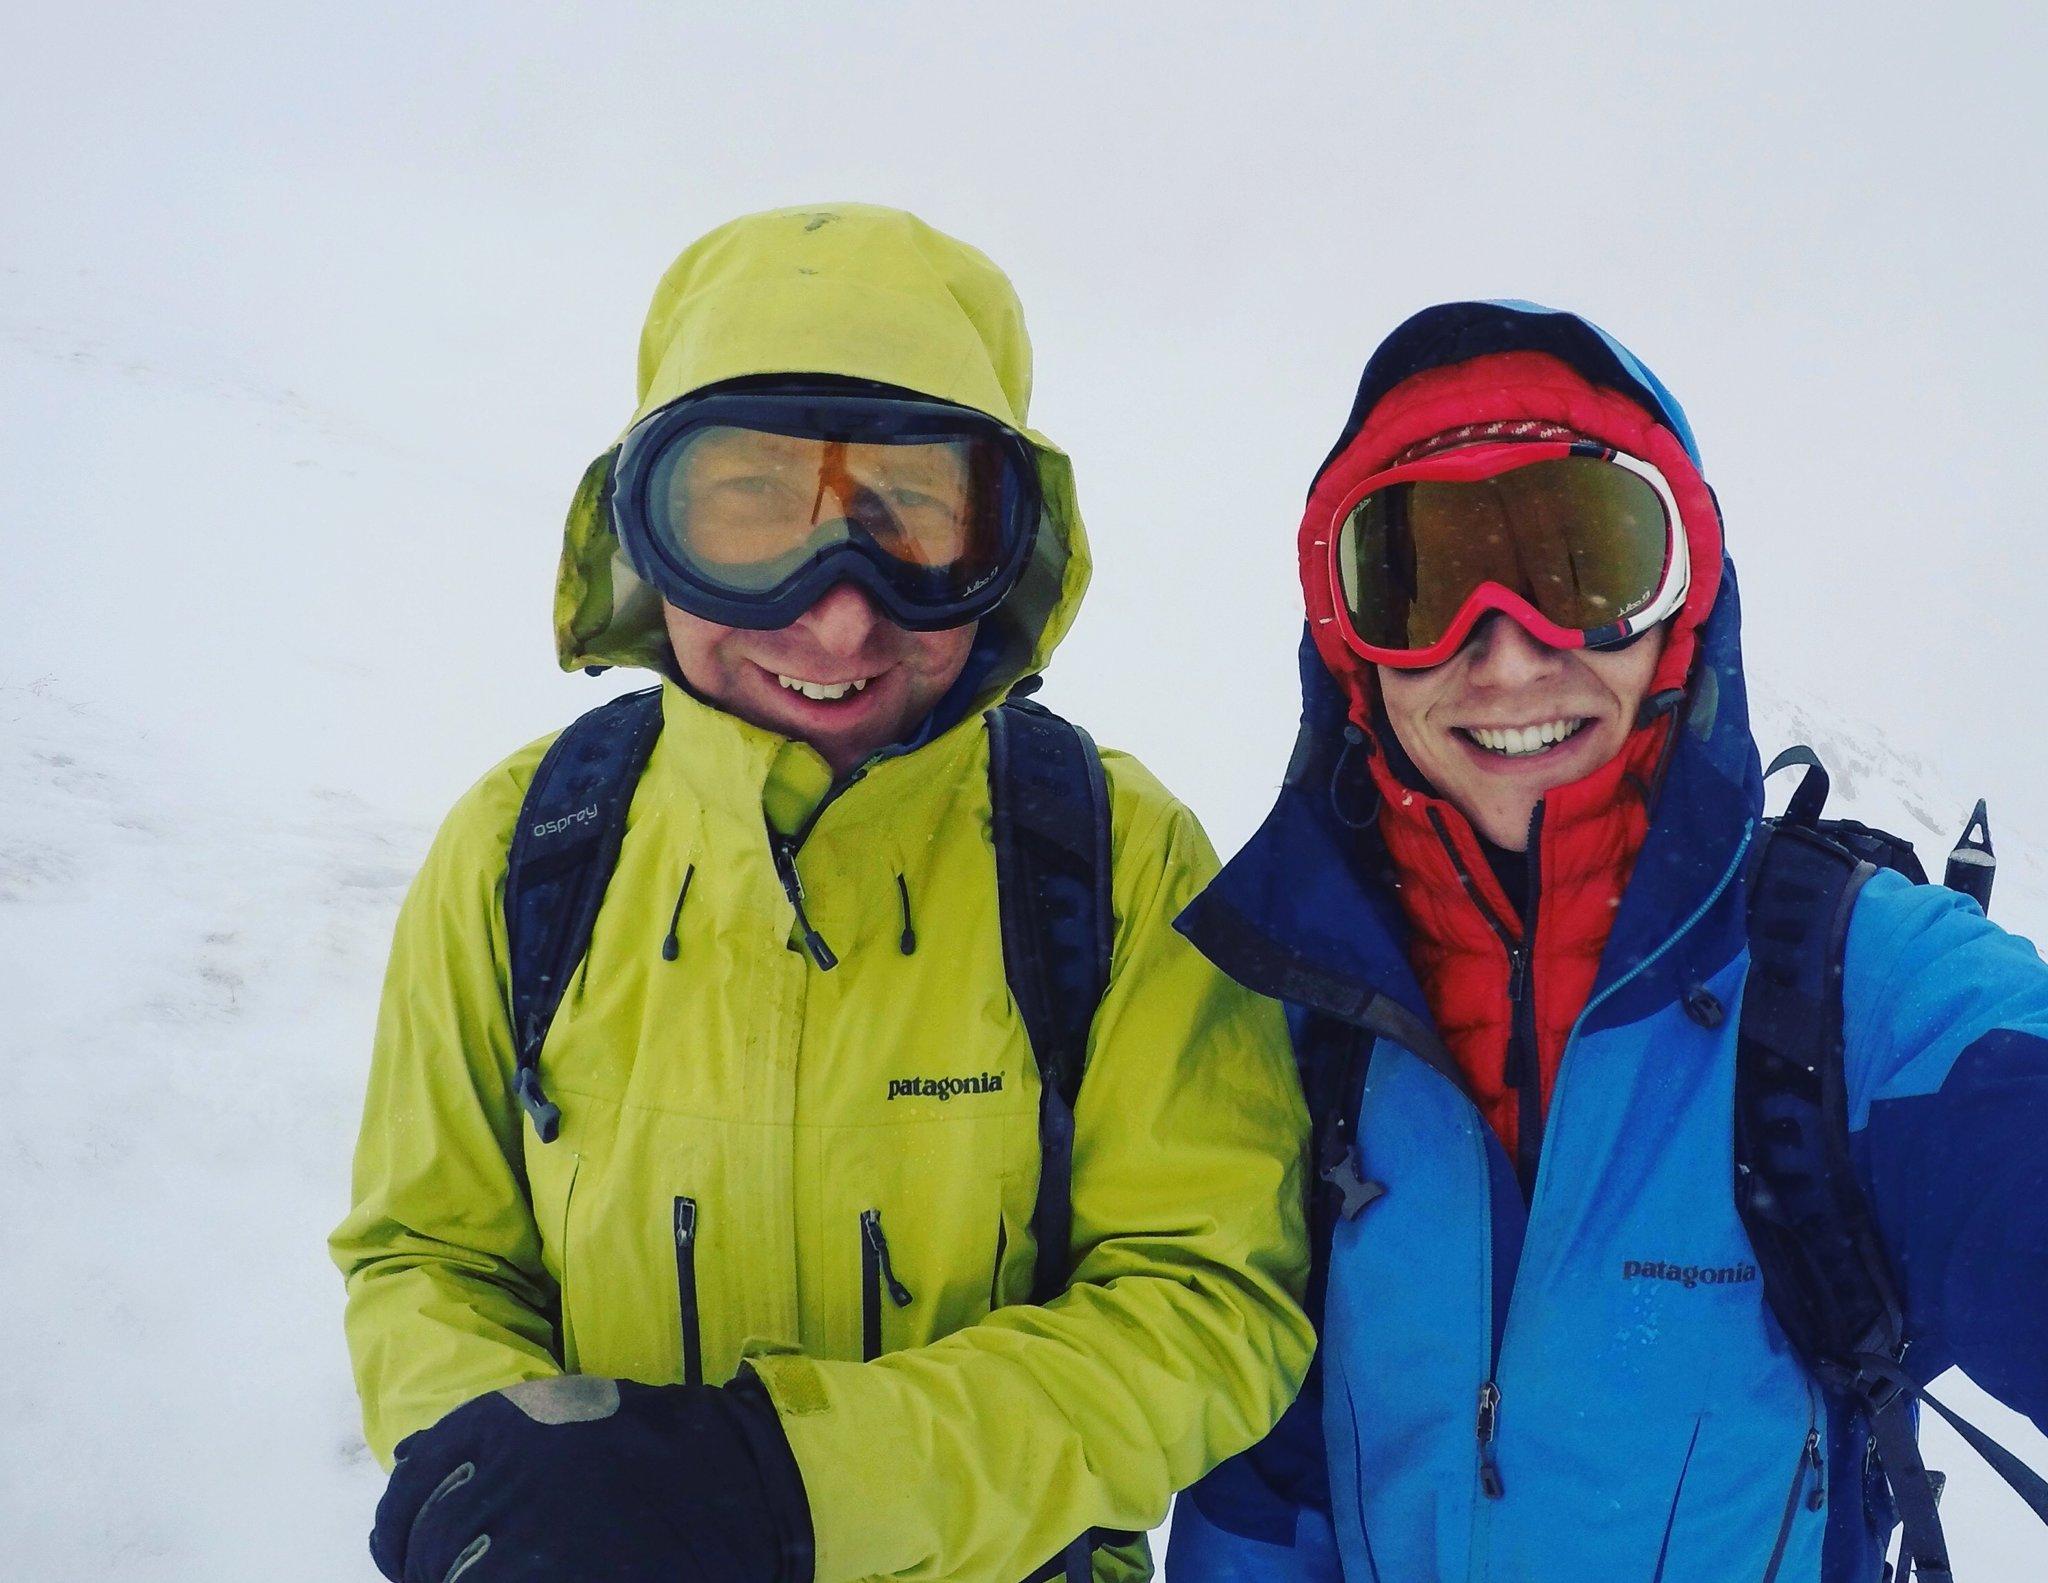 Ski touring in Scotland with oldest son Zach